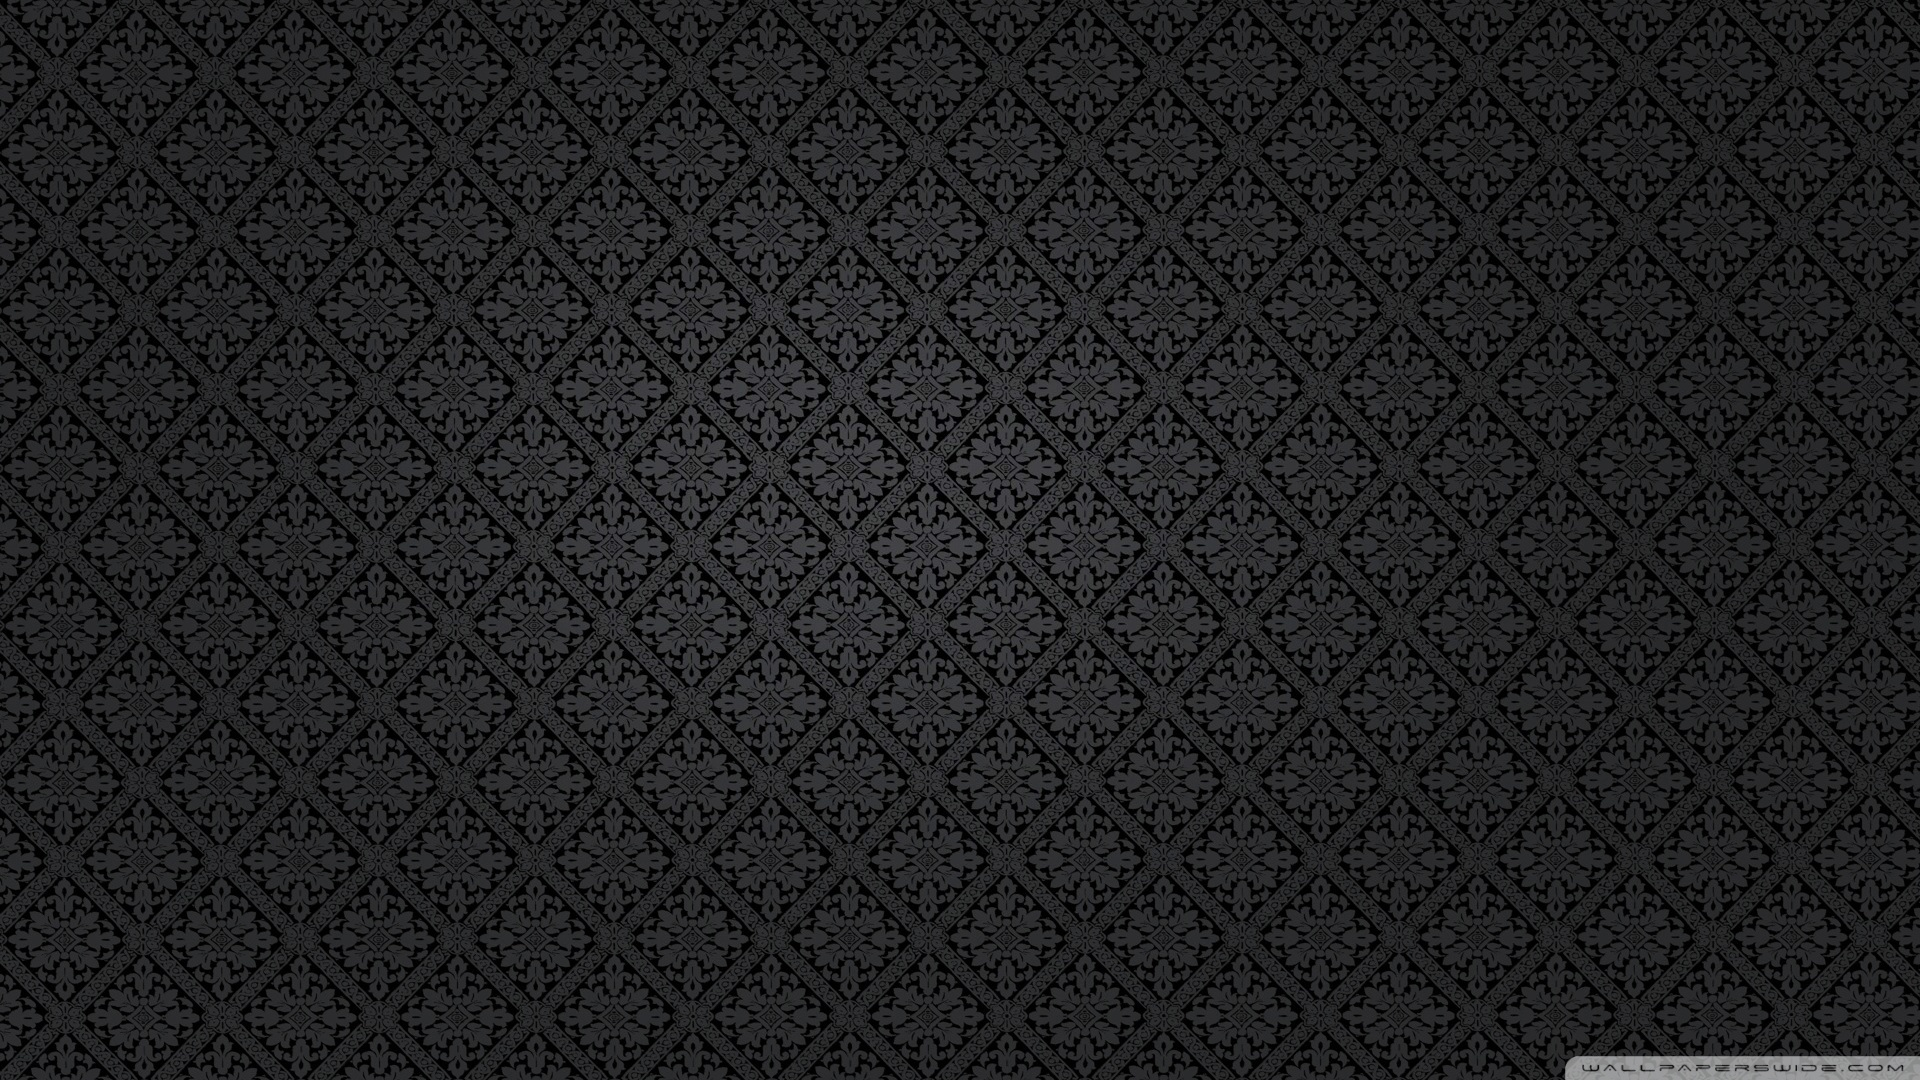 Black And White Pattern wallpaper   980152 1920x1080